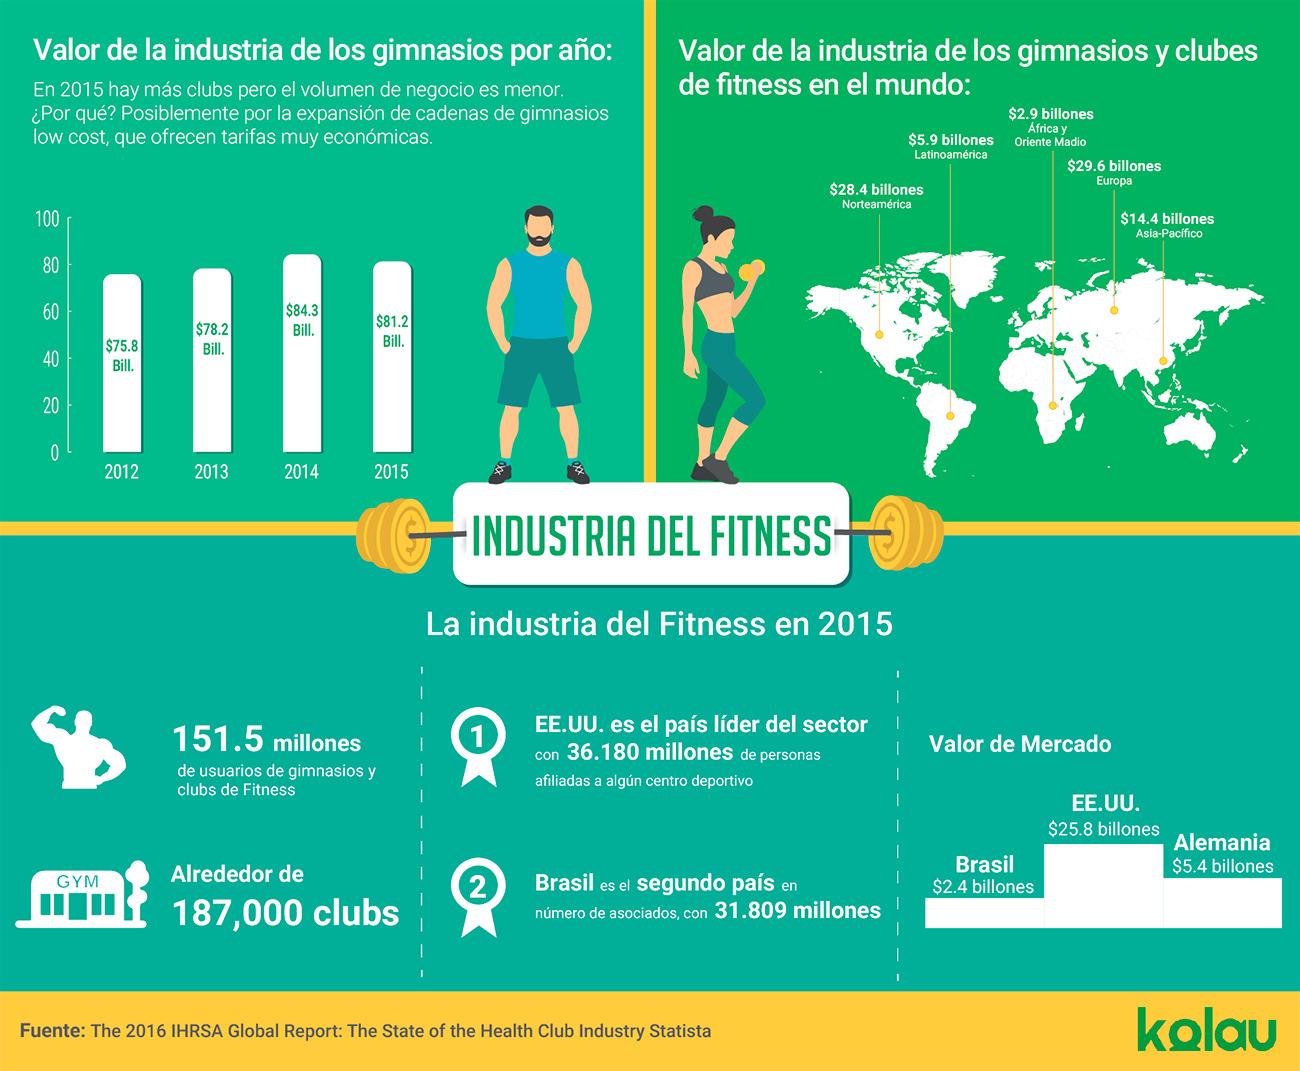 Infografía sobre la industria del Fitness 2015